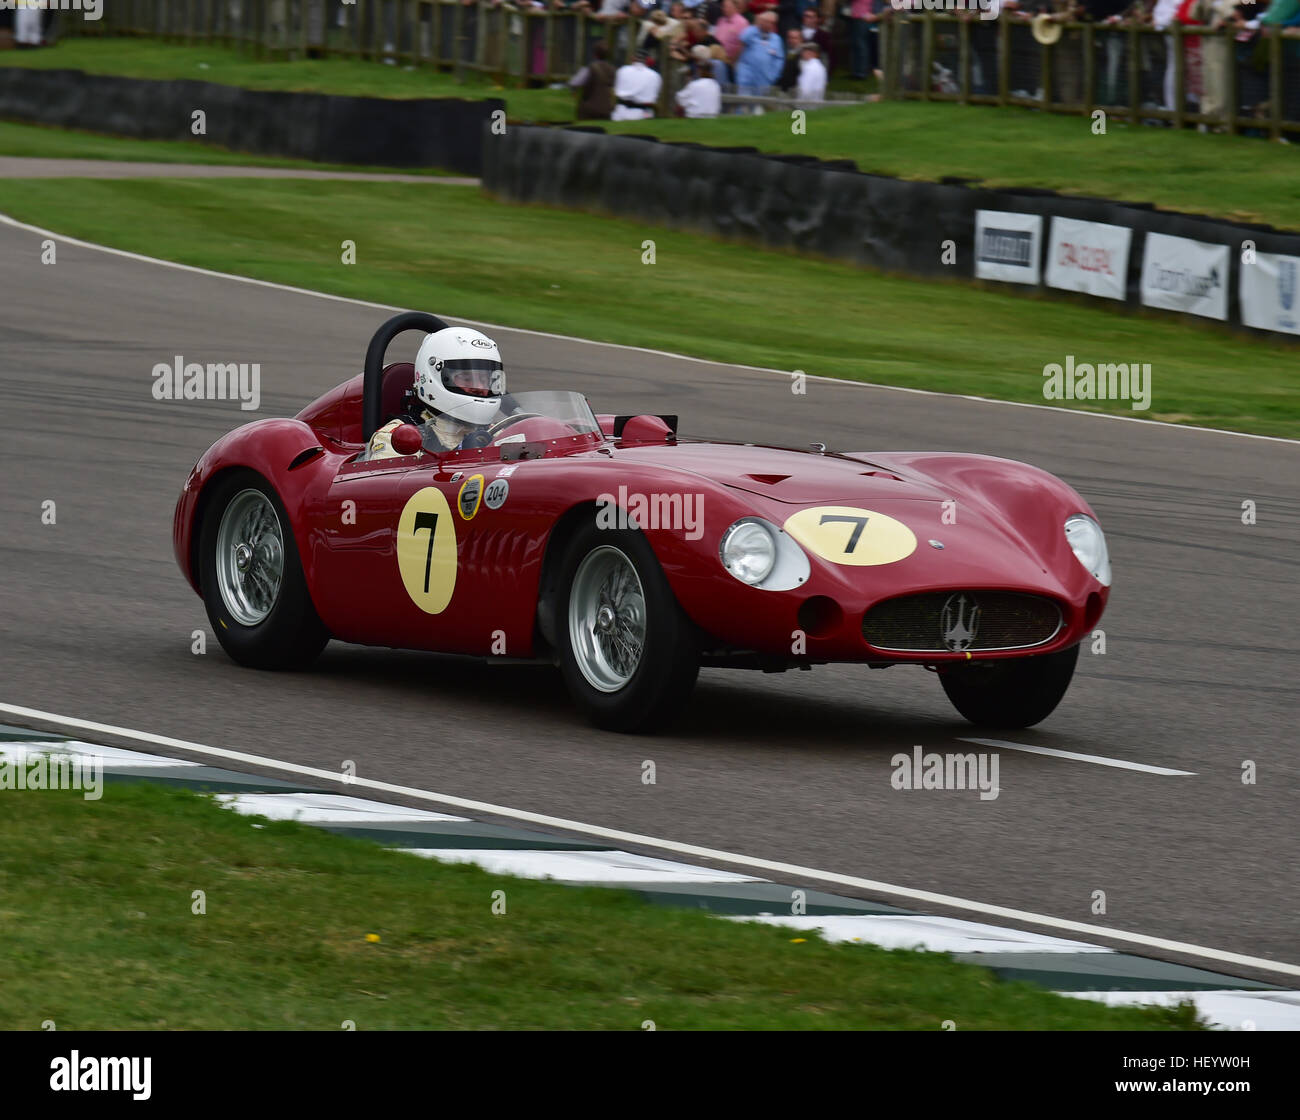 Conrad Ulrich, Maserati 300 s, Freddie März Memorial Trophy, Sports Racing Cars, Goodwood Revival 2016, 2016, Stockbild